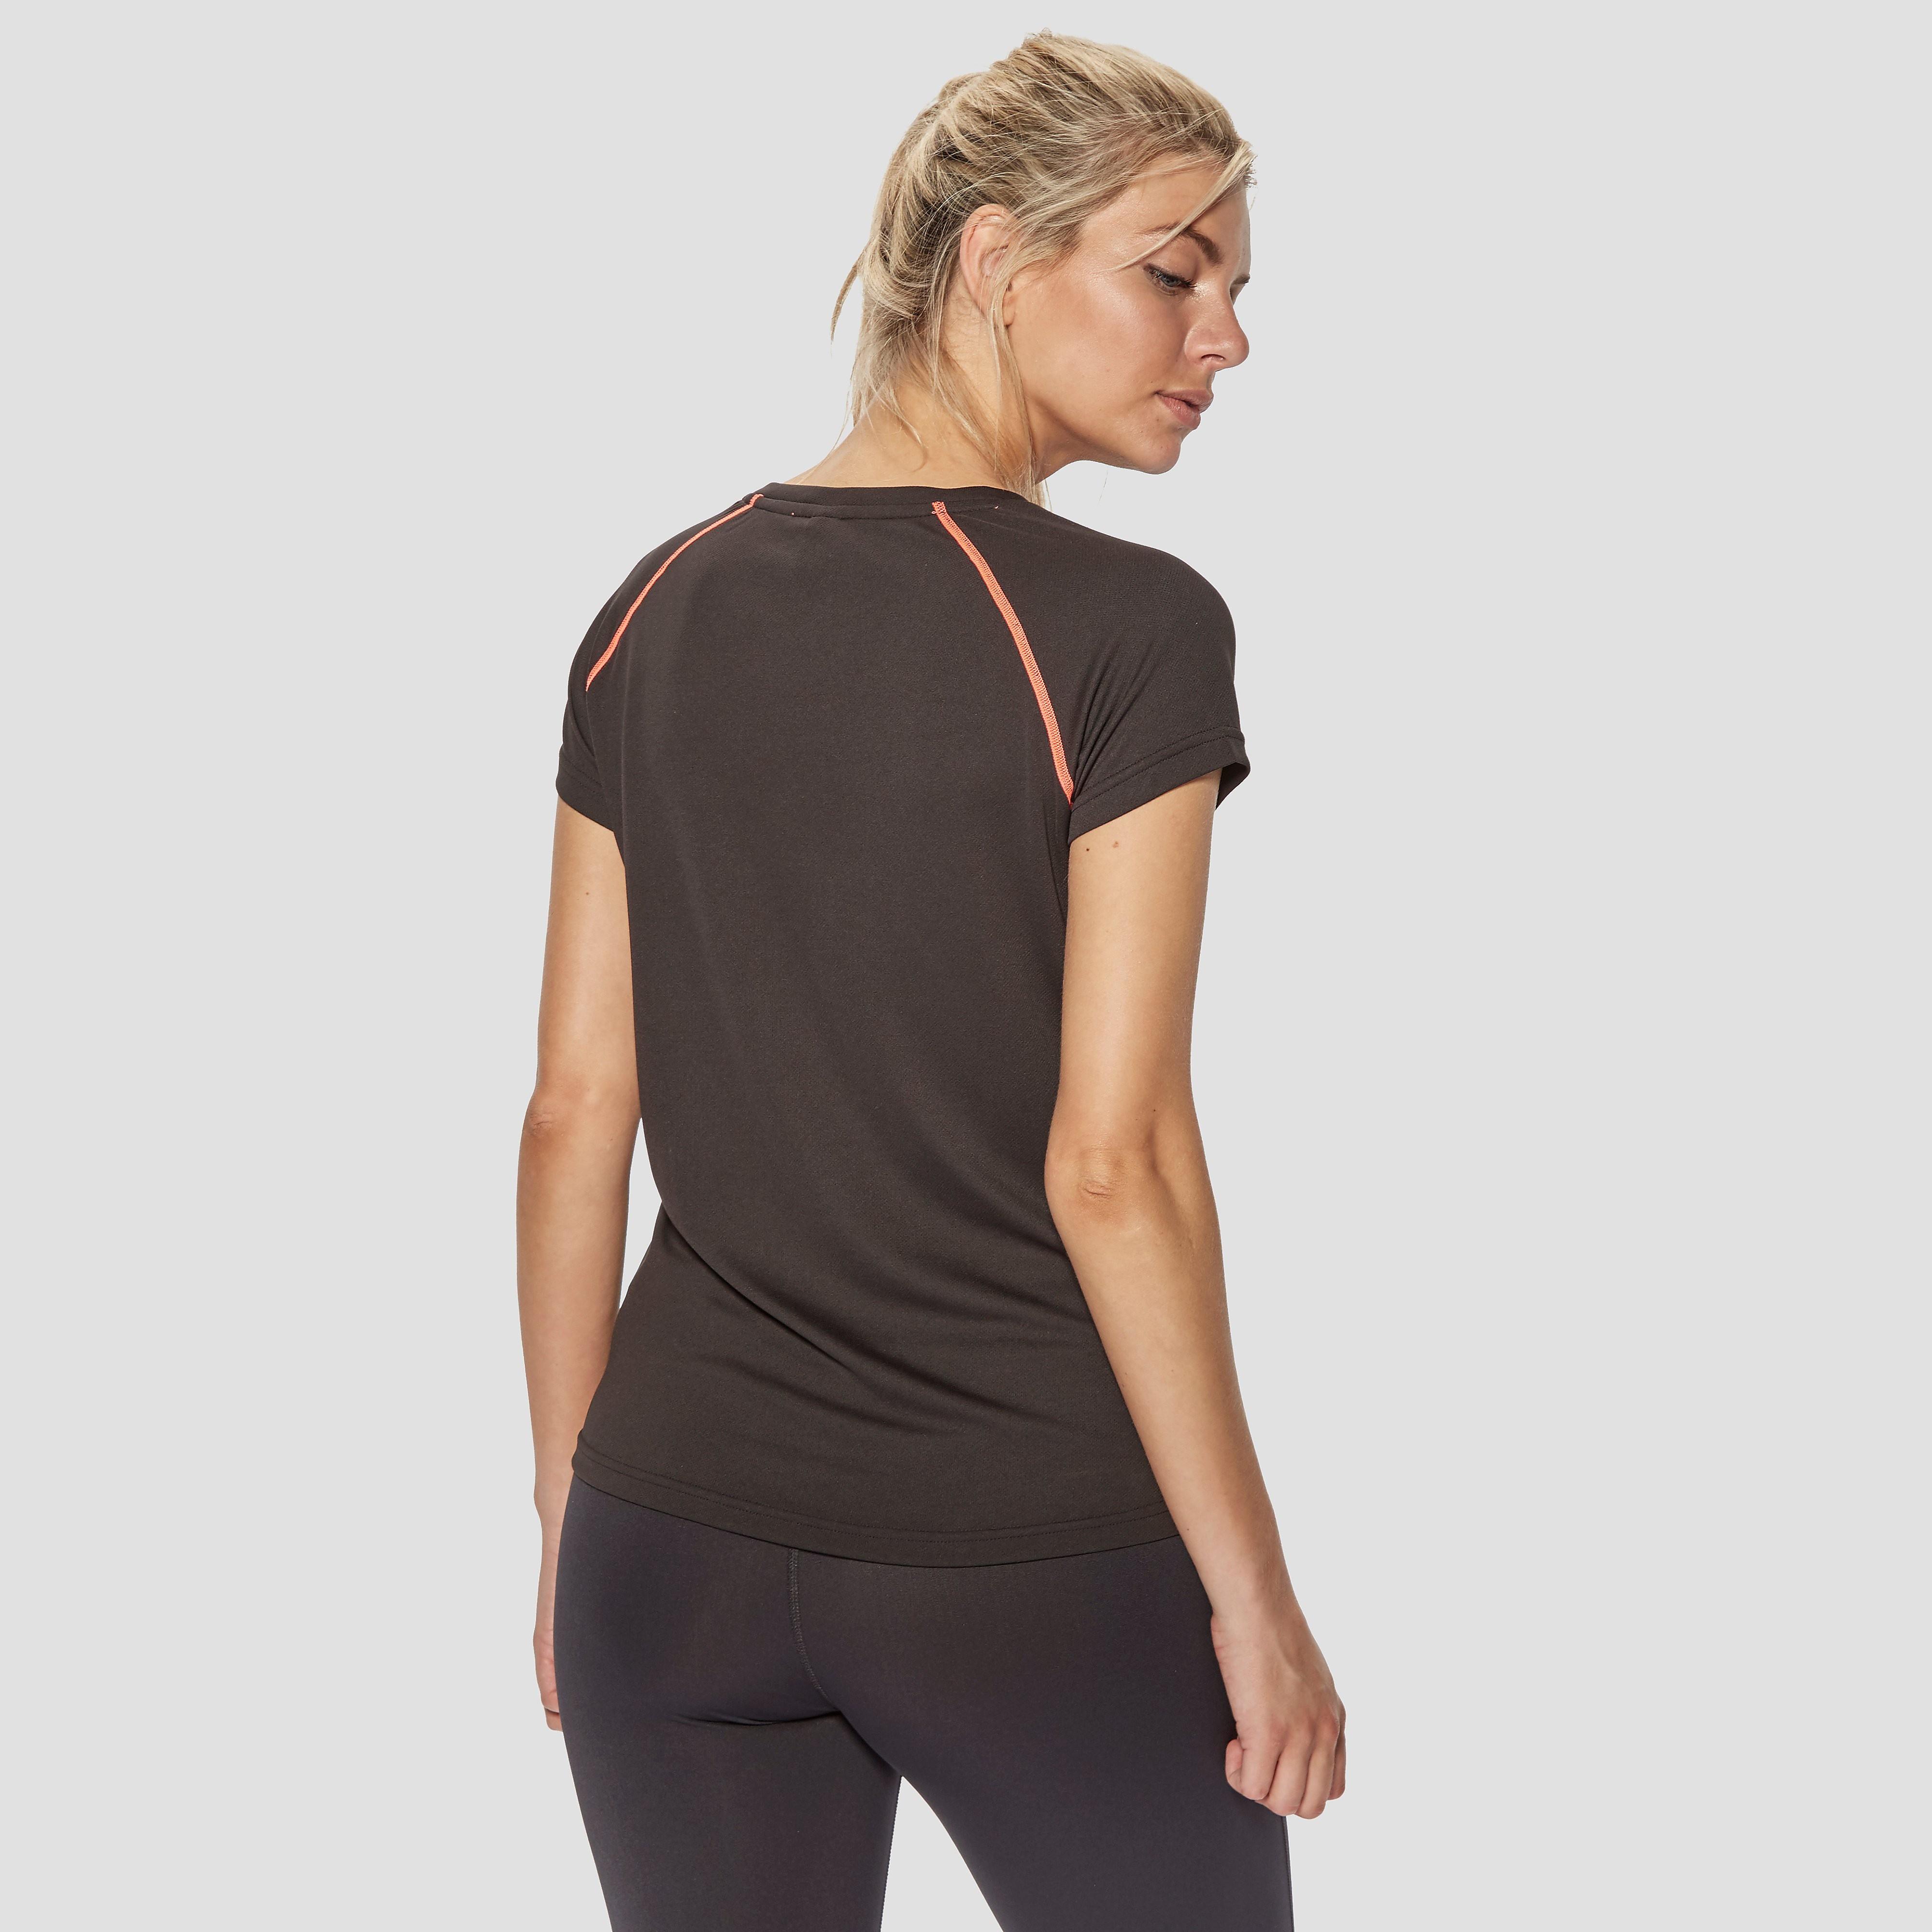 Helly Hansen Active Flow Women's T-shirt